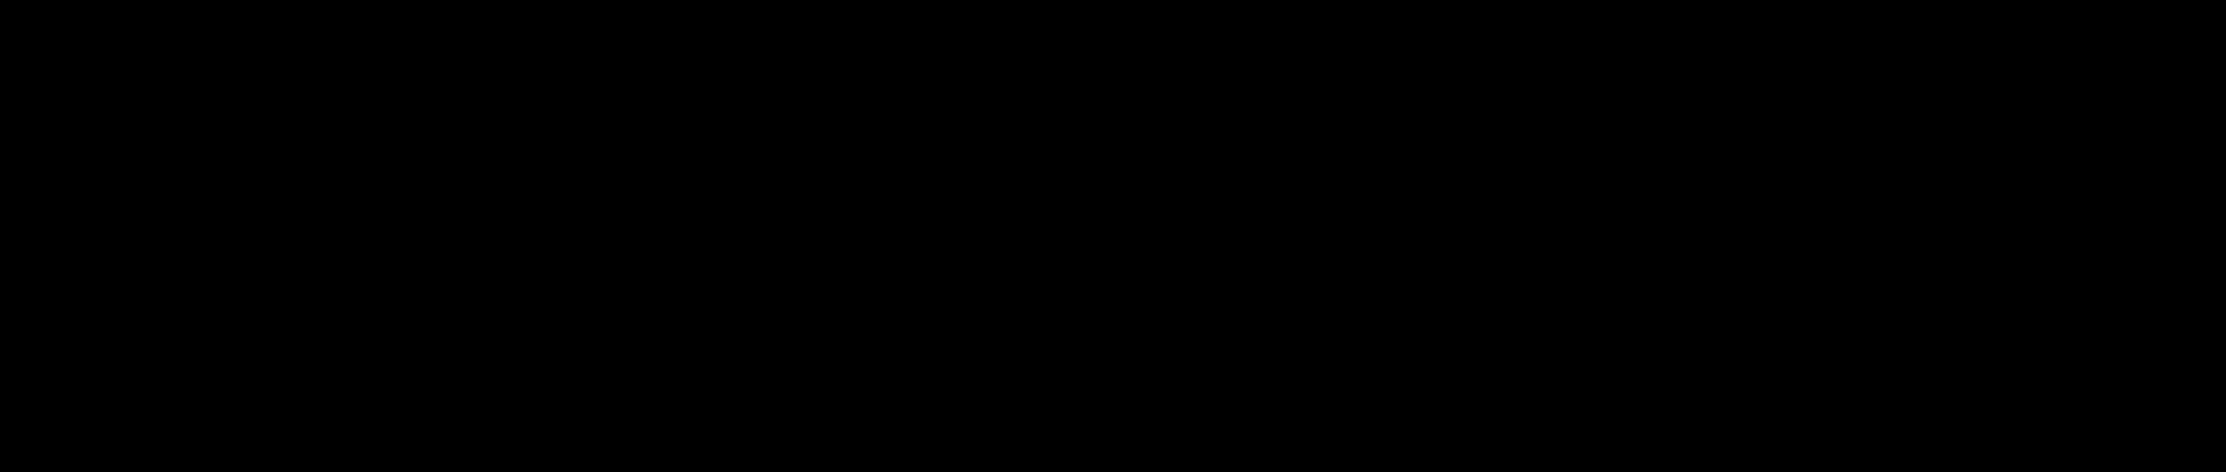 N-(1-Chloroacetamido-6,9,12-trioxa-3-azatetradecanyl-14)-acrylamide